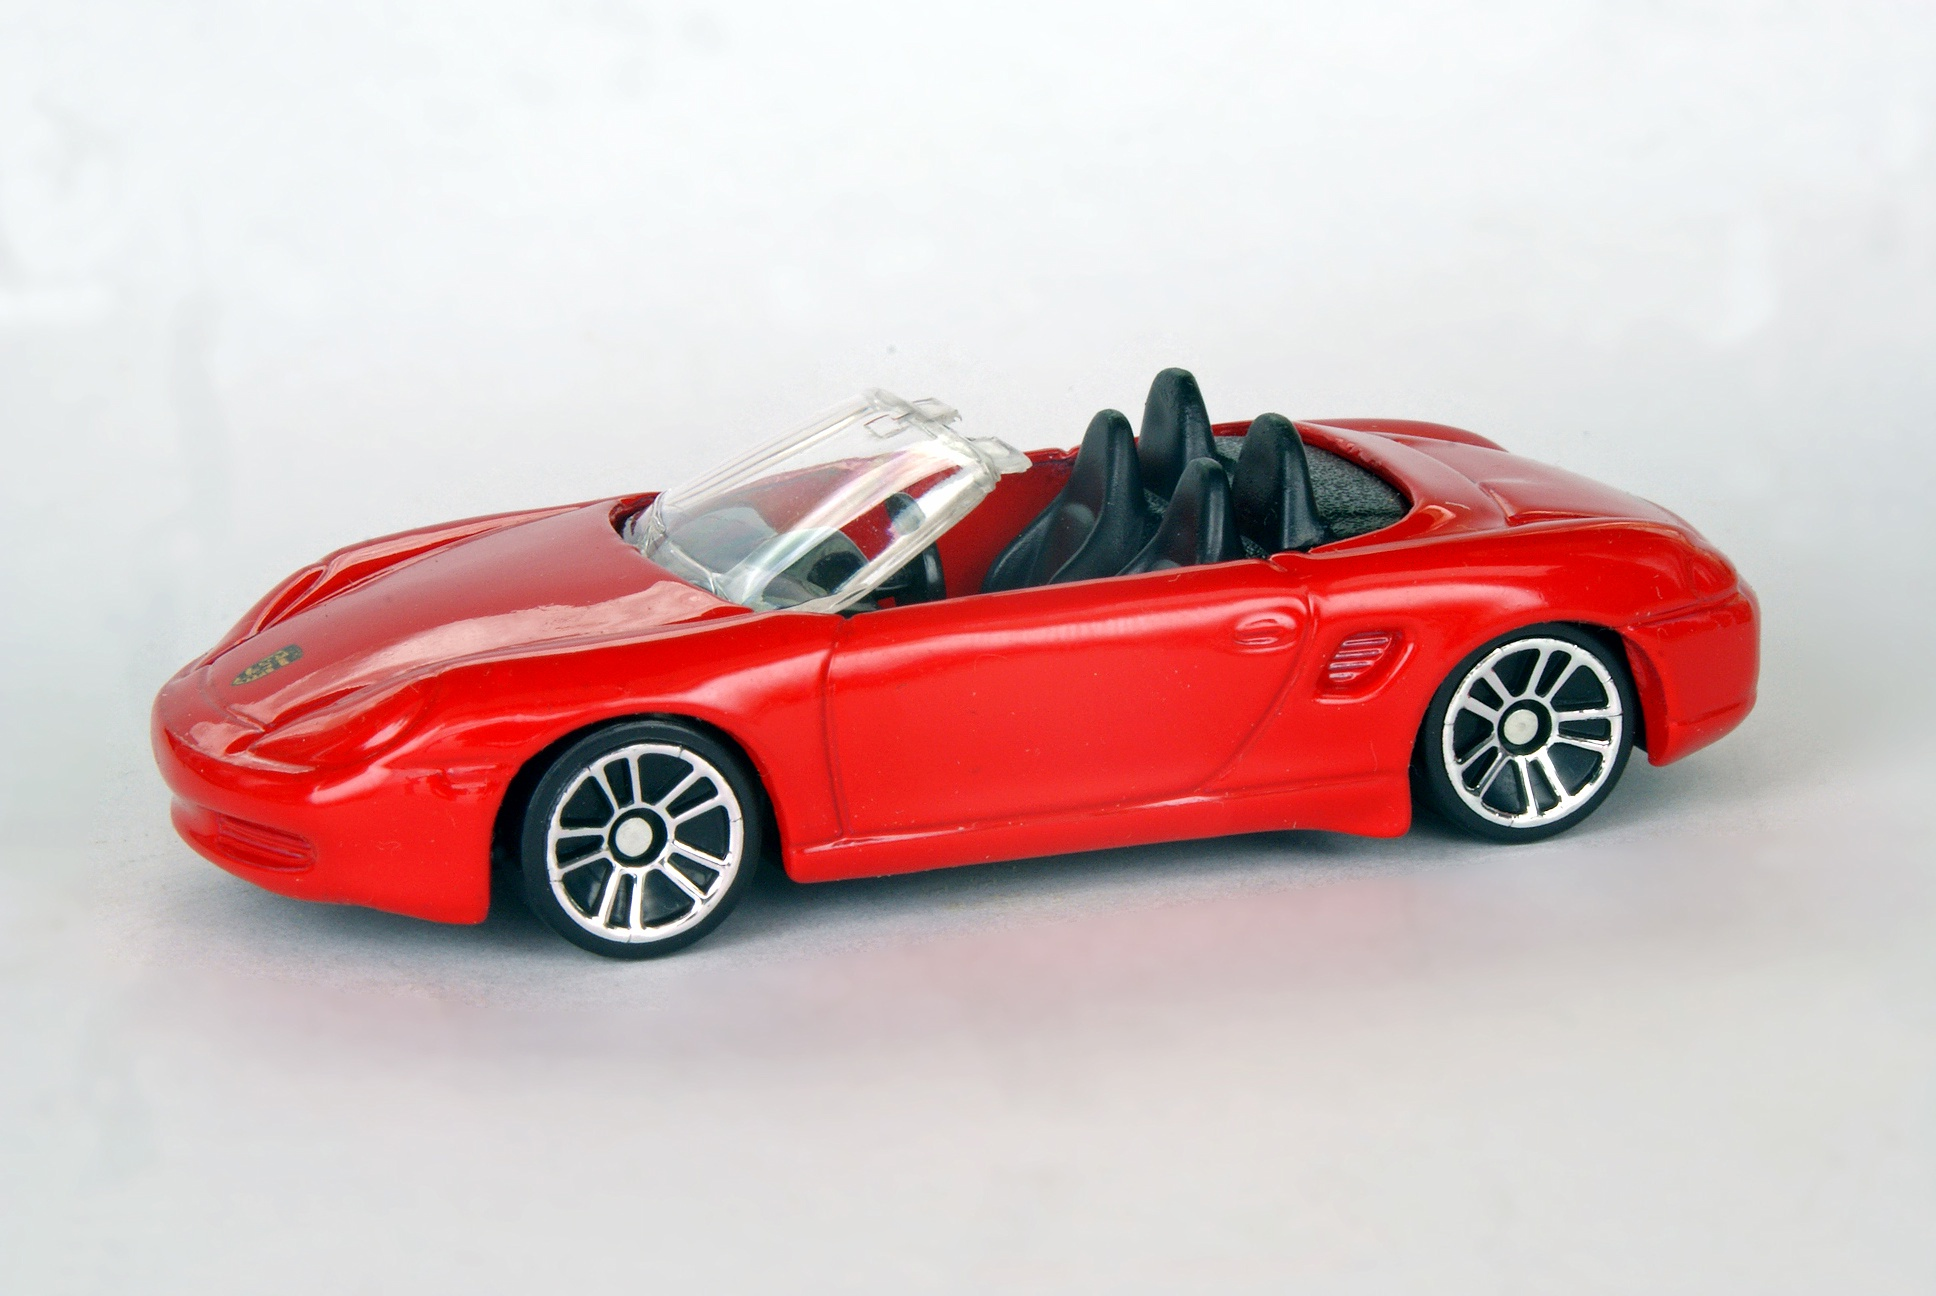 Porsche Boxster | Maisto Diecast Wiki | Fandom powered by Wikia